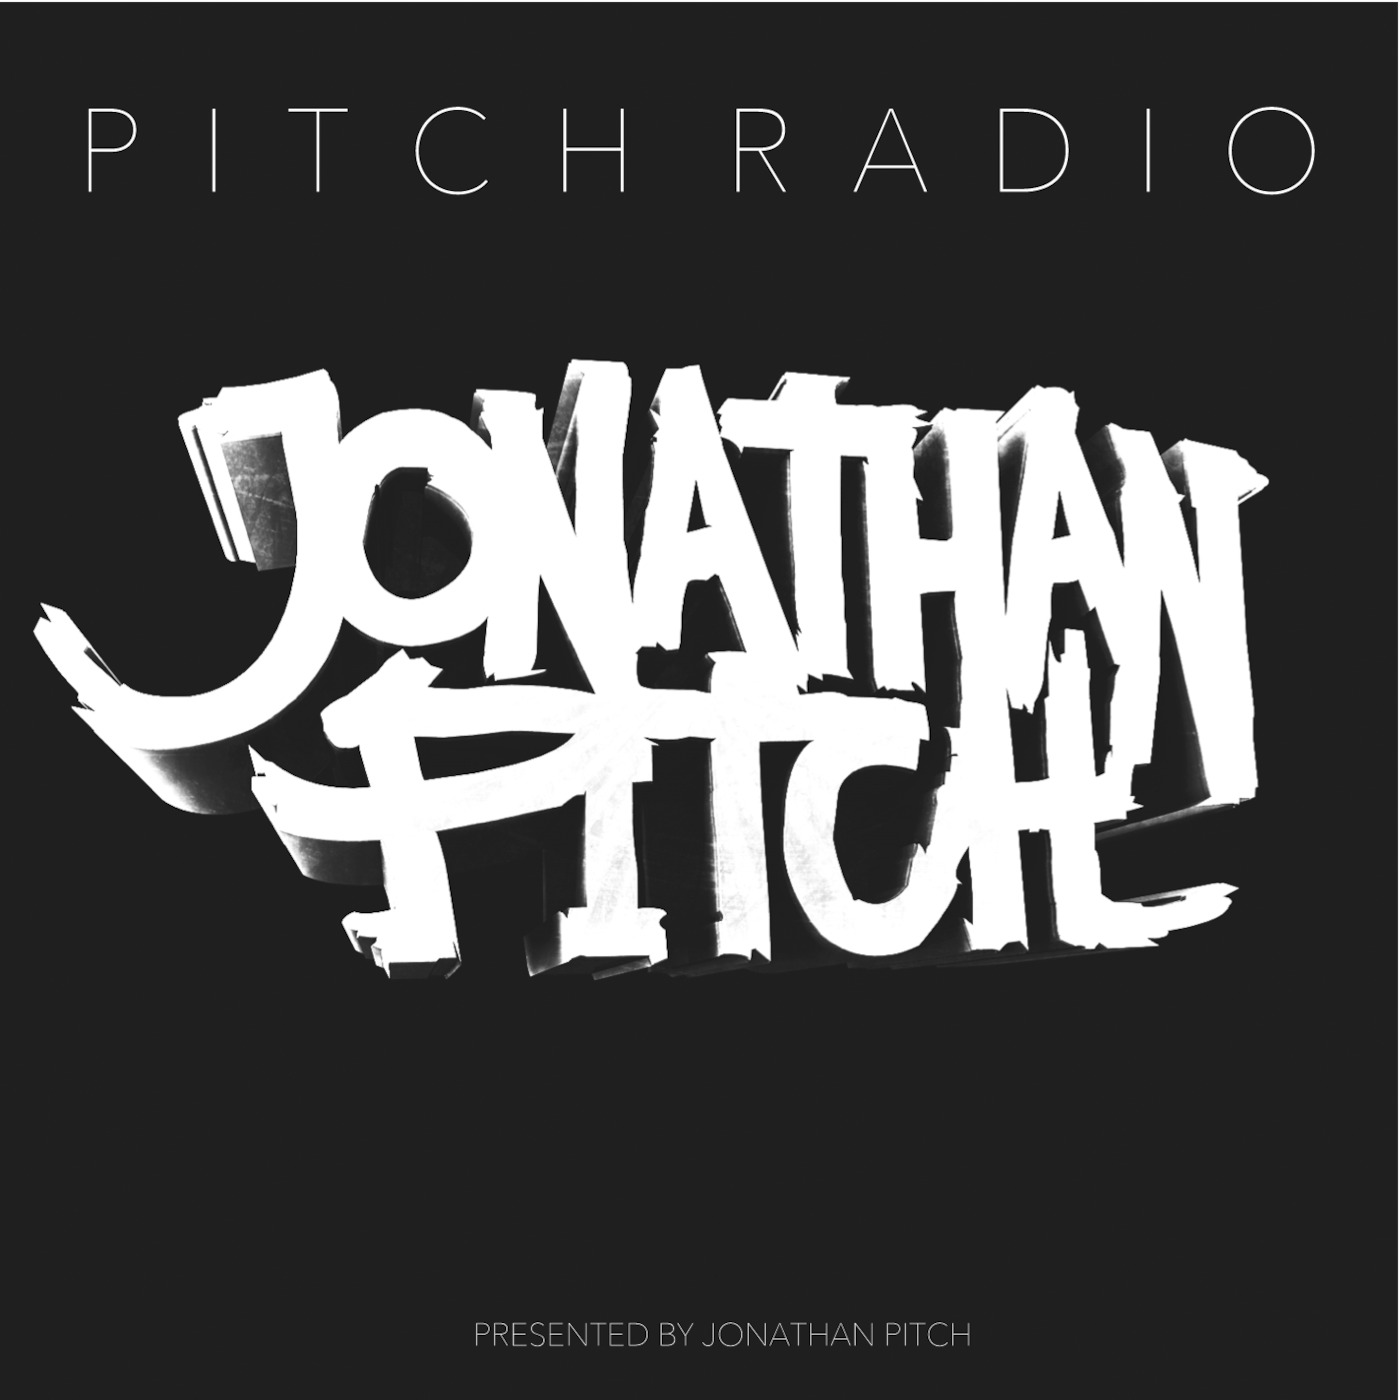 Jonathan Pitch Presents: PITCH RADIO